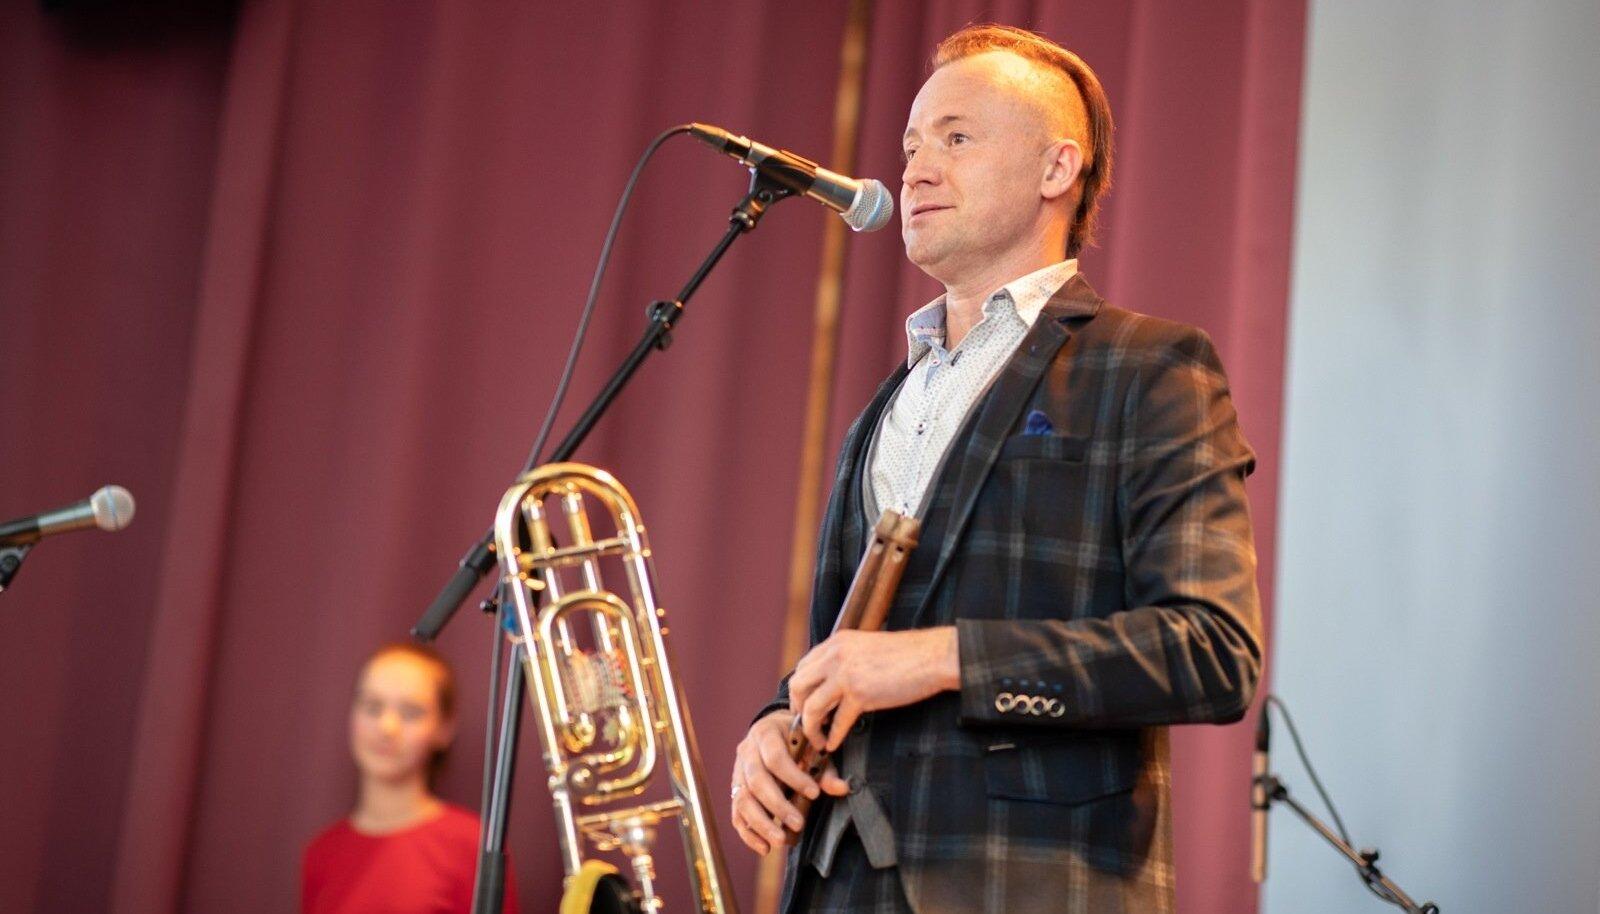 Perebändid: Ruslan Trochynskyi lastega